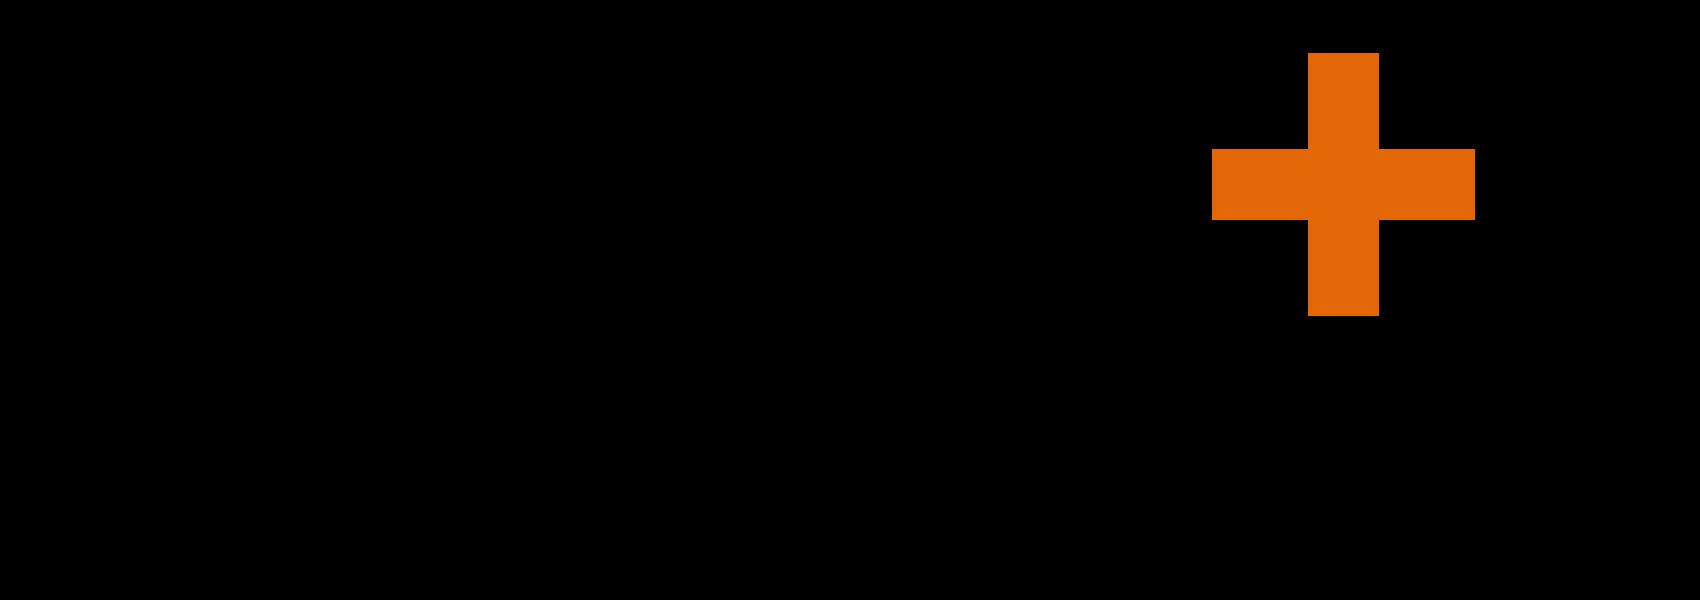 loghi casa più versione principale